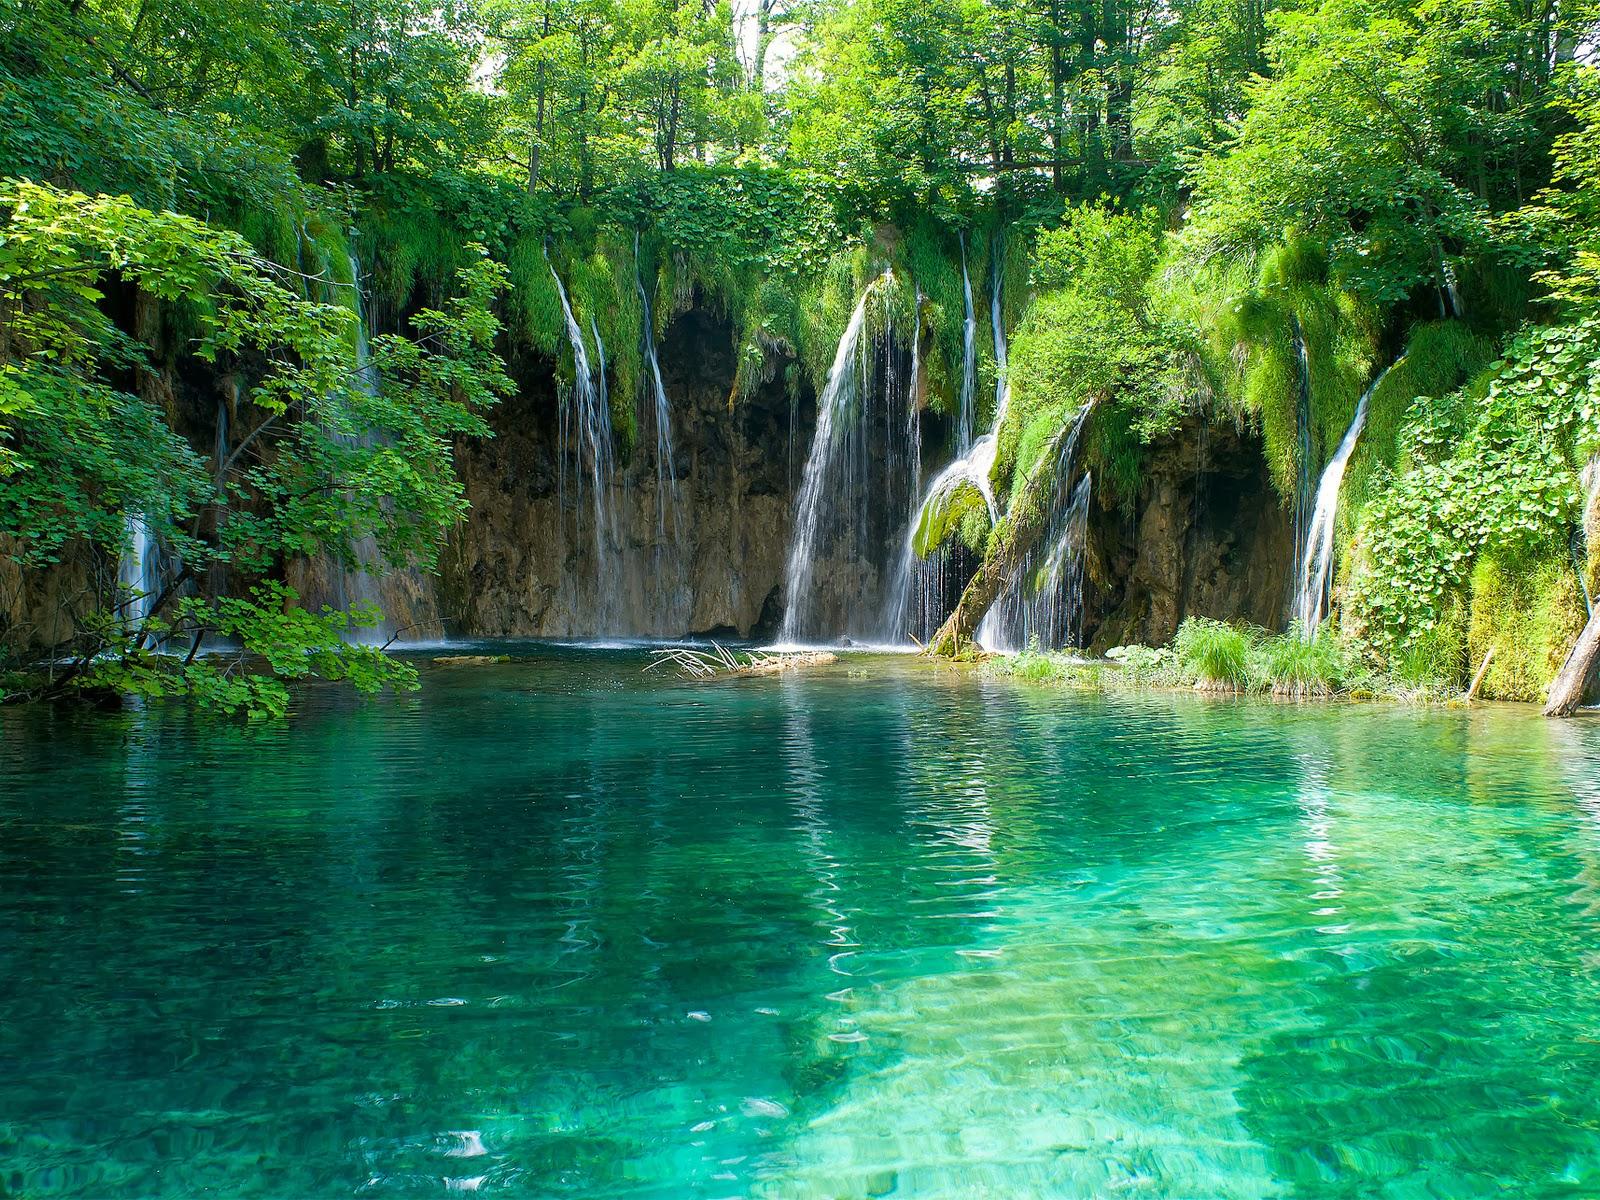 Fondos paisajes cascadas imagui for Estanques naturales